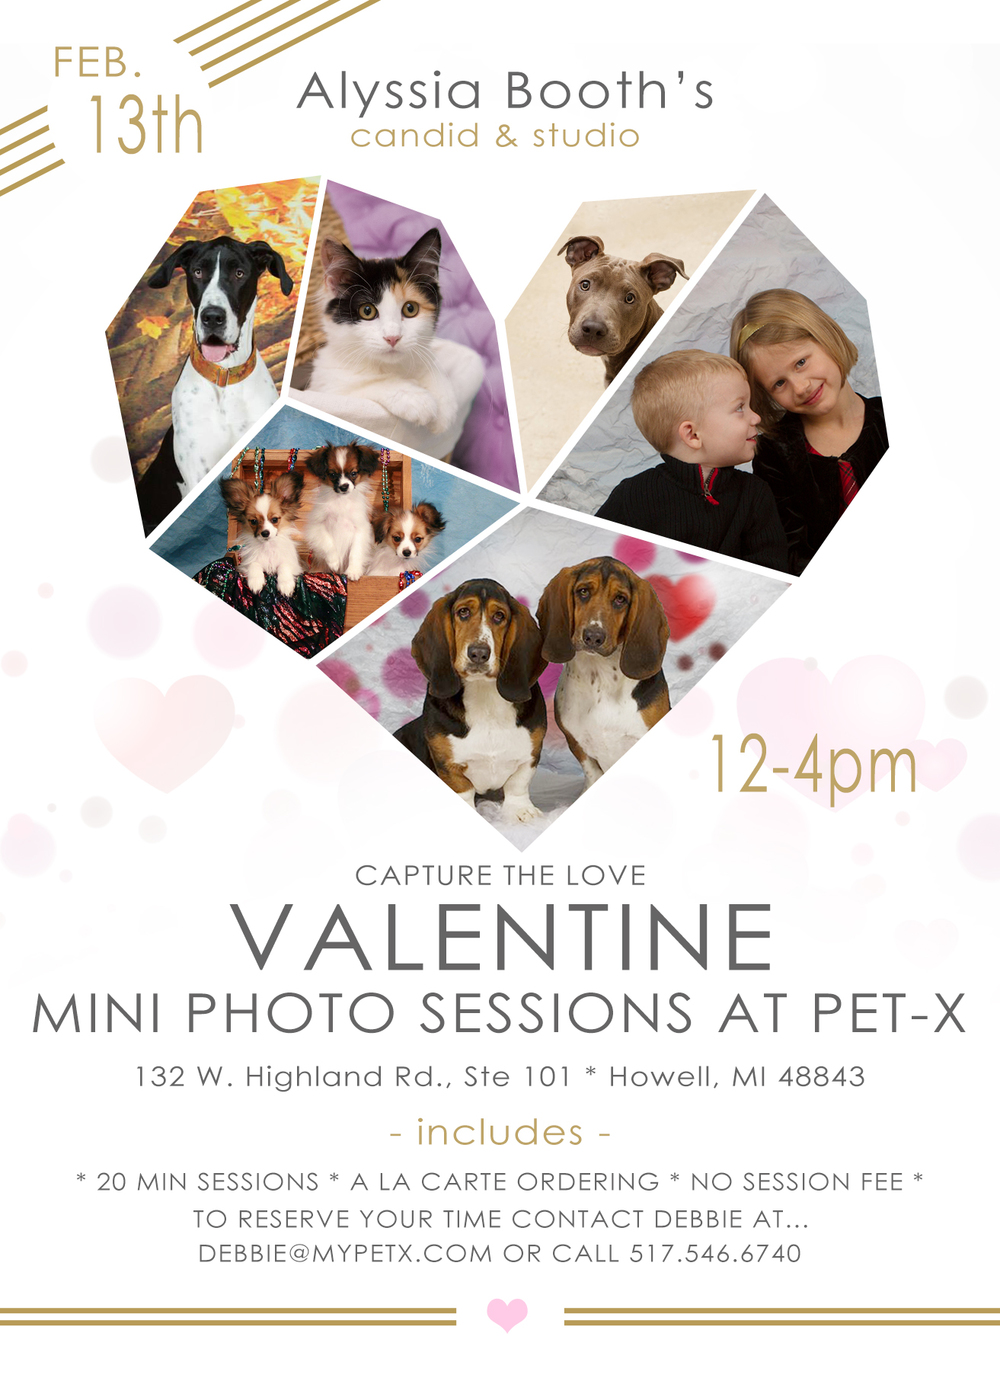 PET-X Howell Michigan Pet Photo Day Alyssia Booth's Canddi & Studio